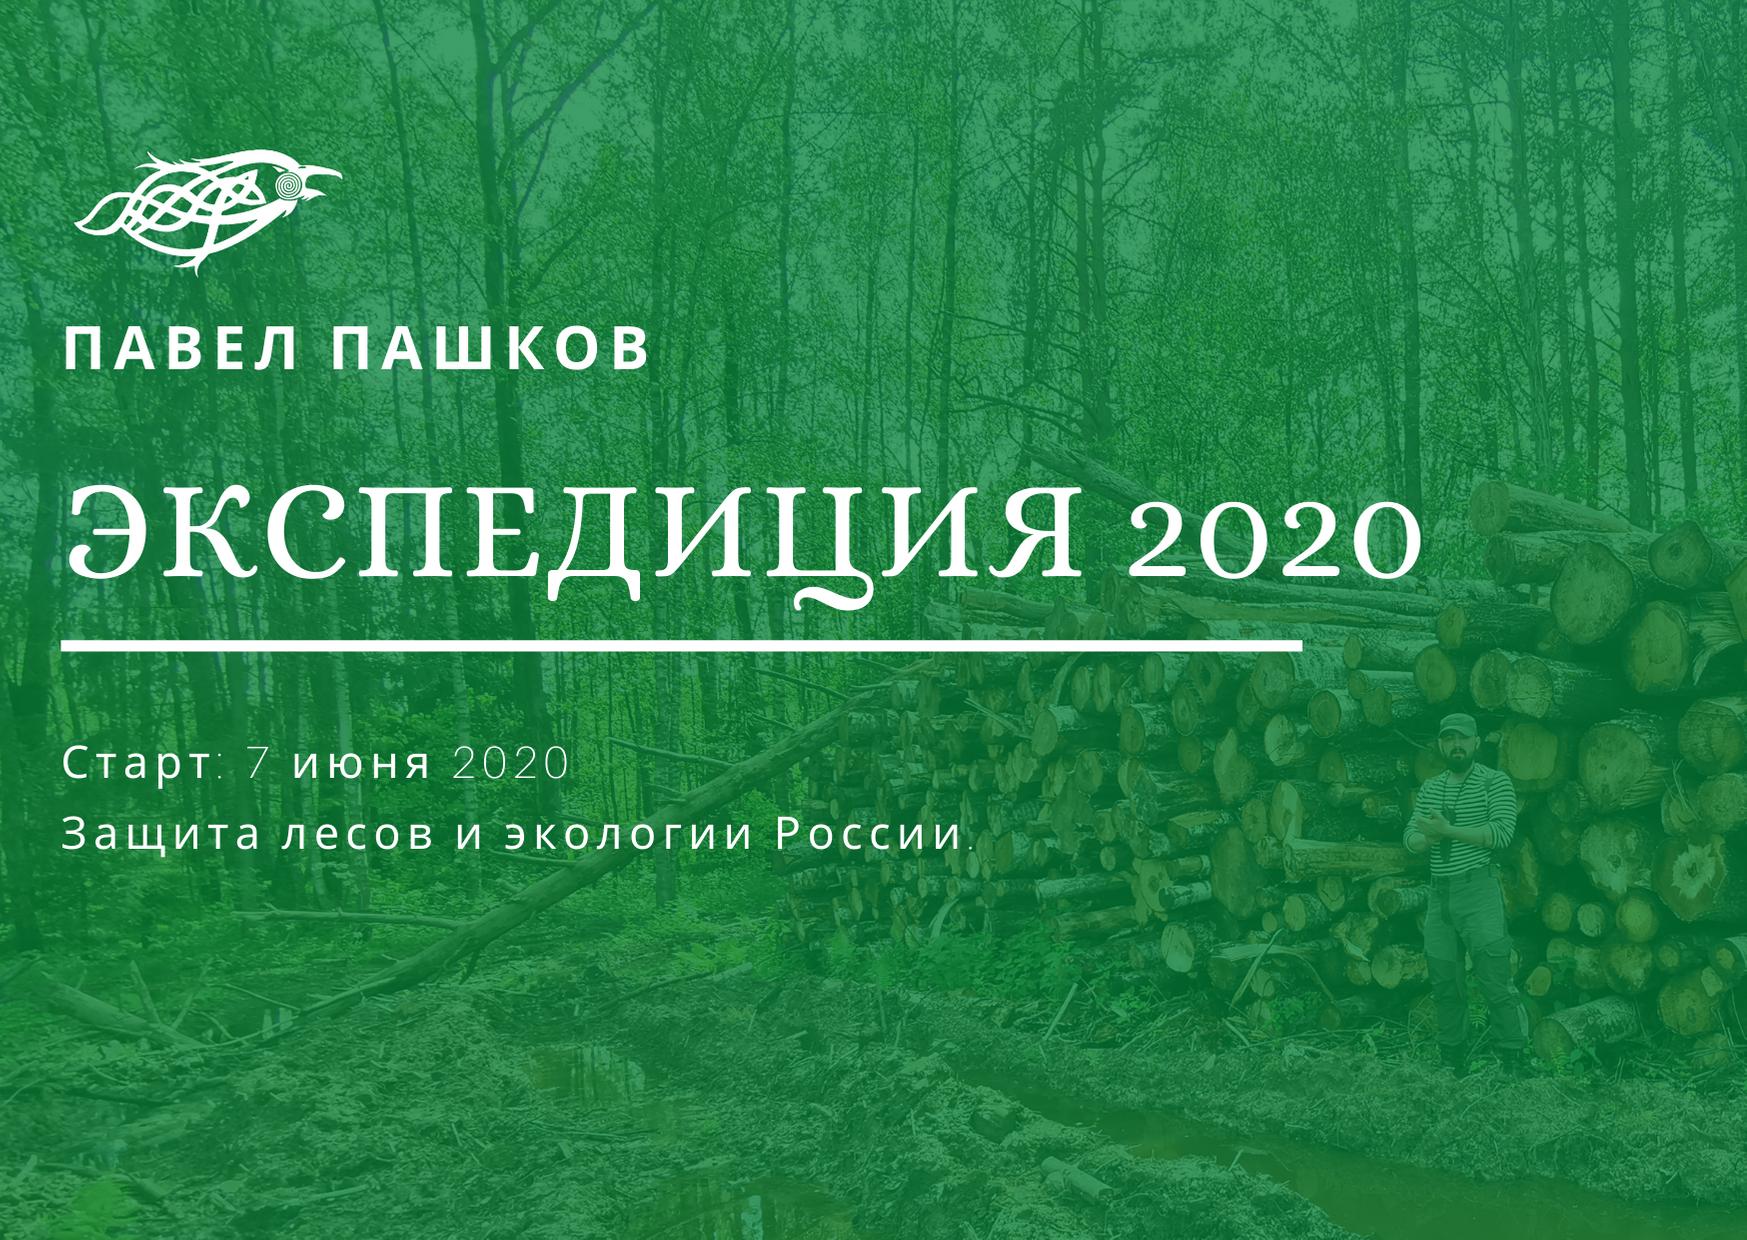 Экспедиция 2020